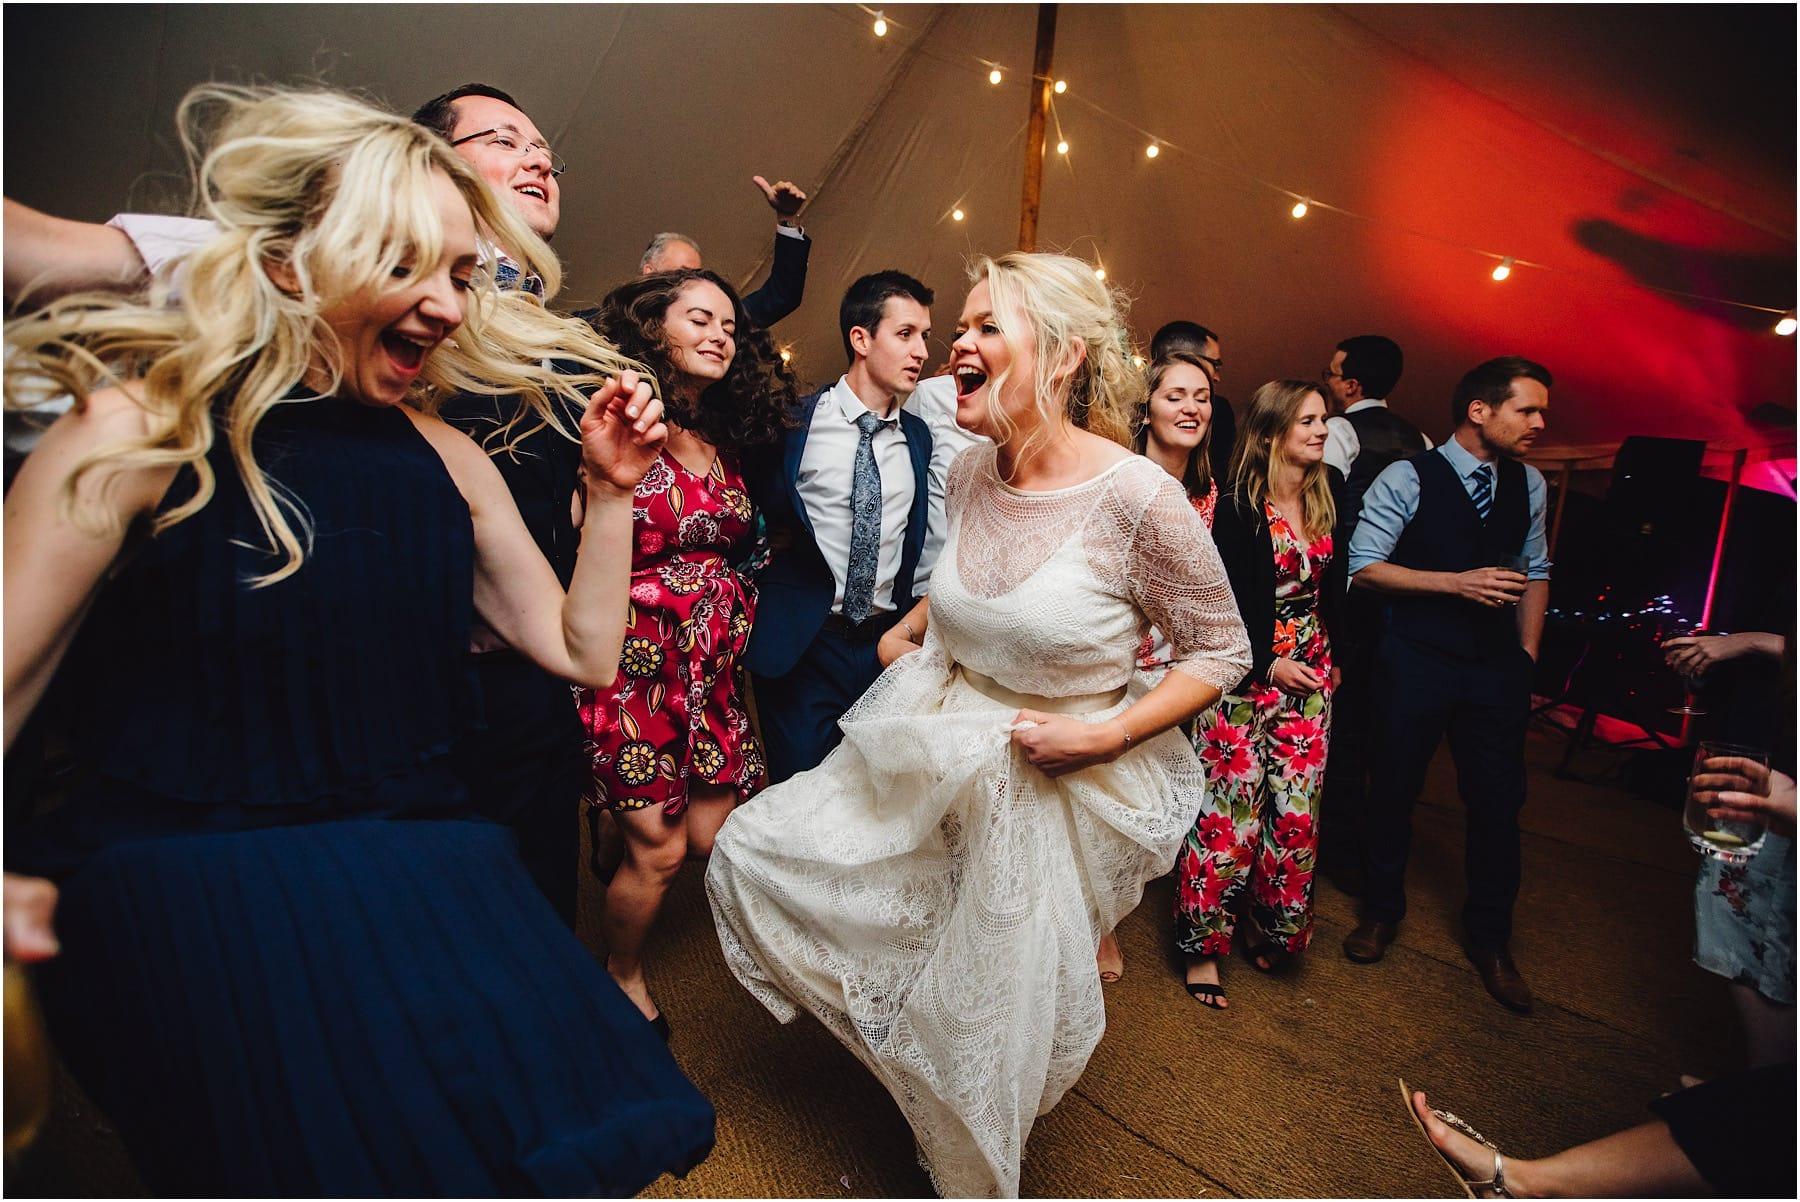 bride lifter her dress whilst dancing